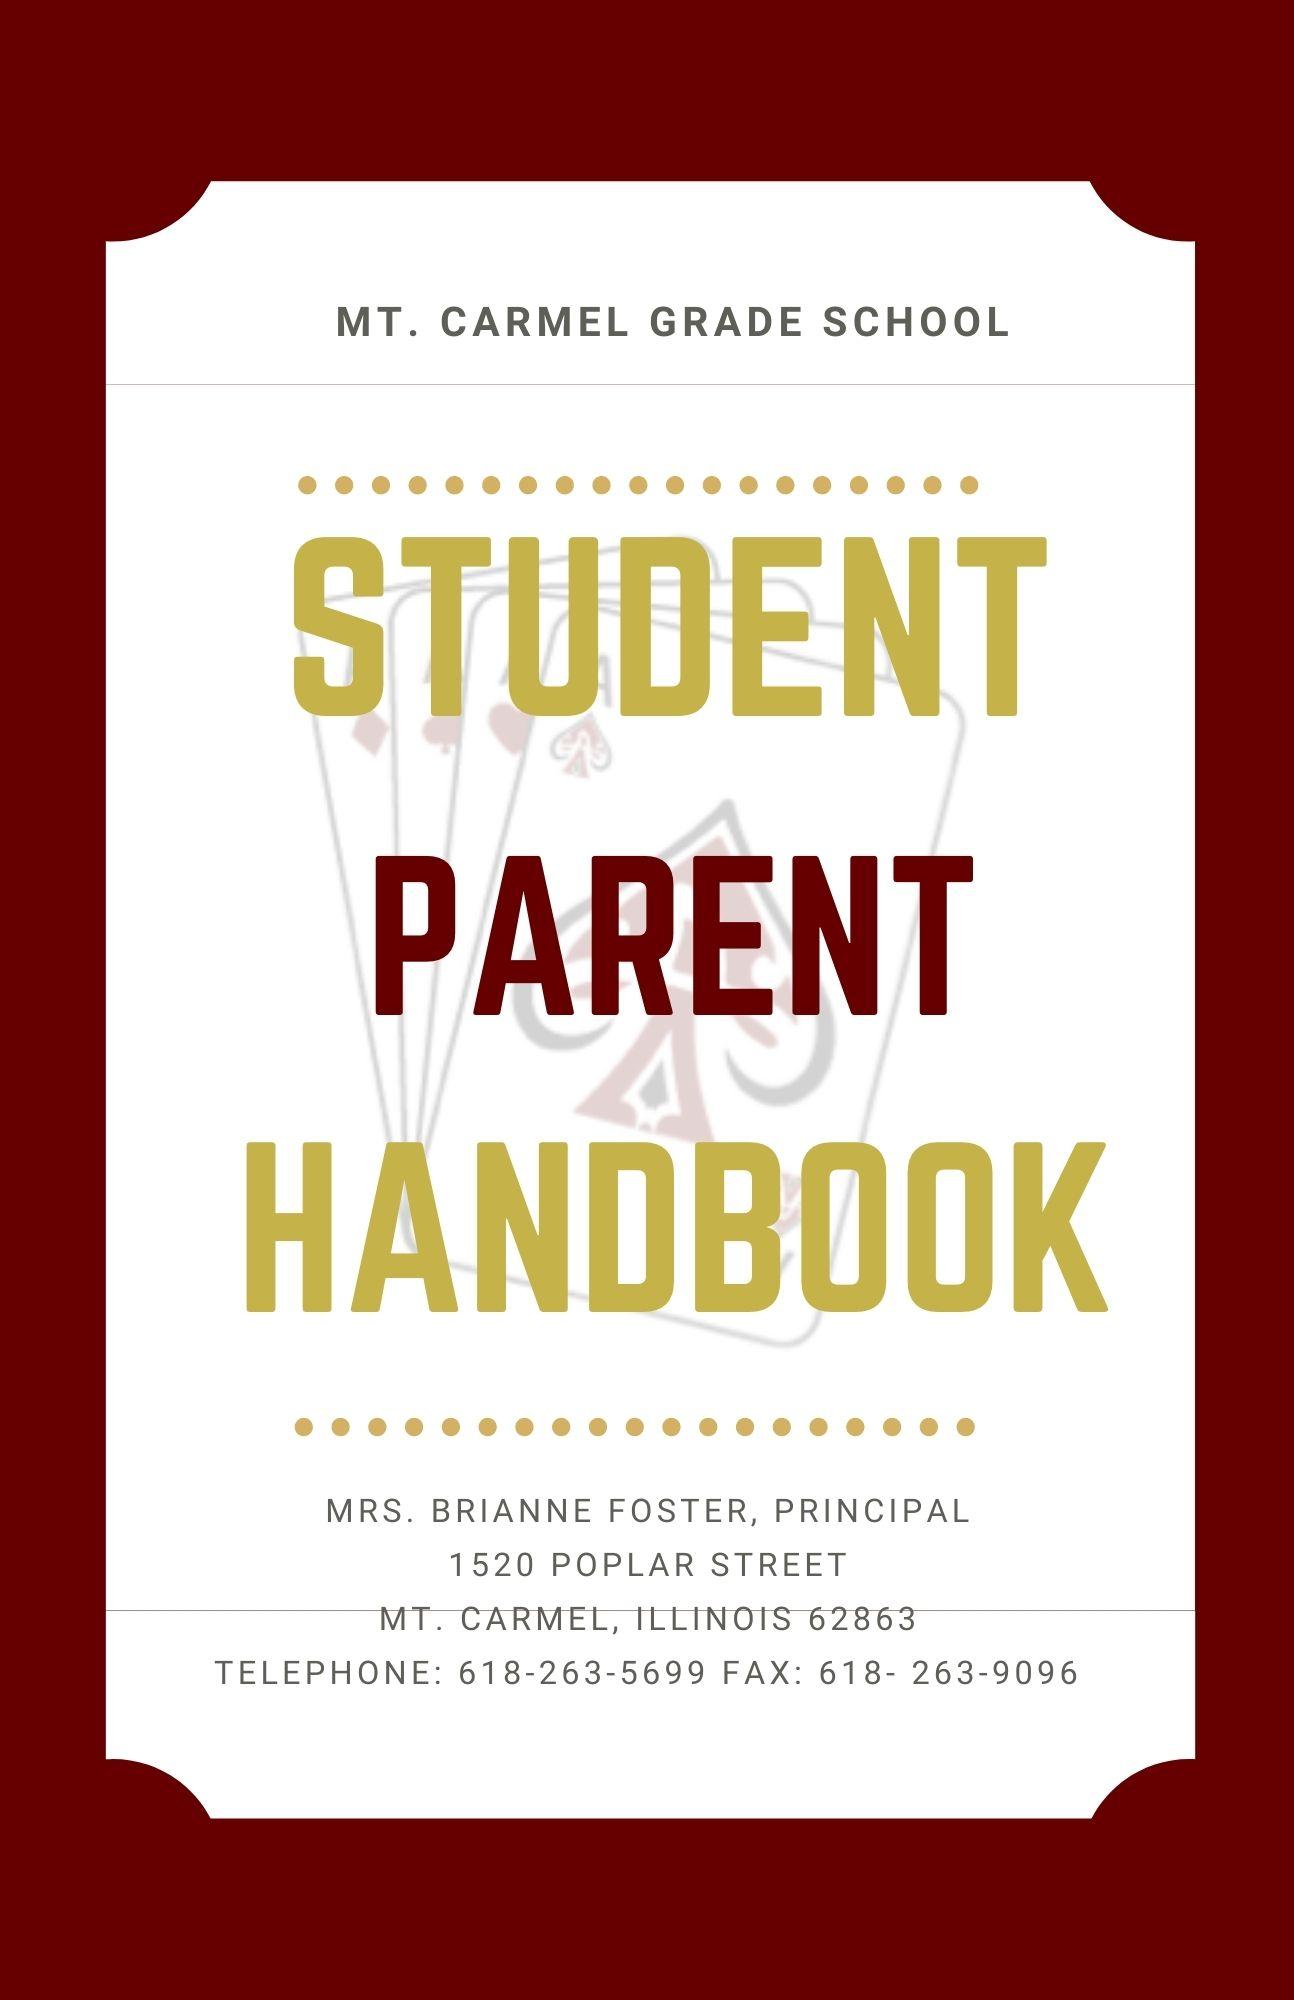 MCGS student parent handbook